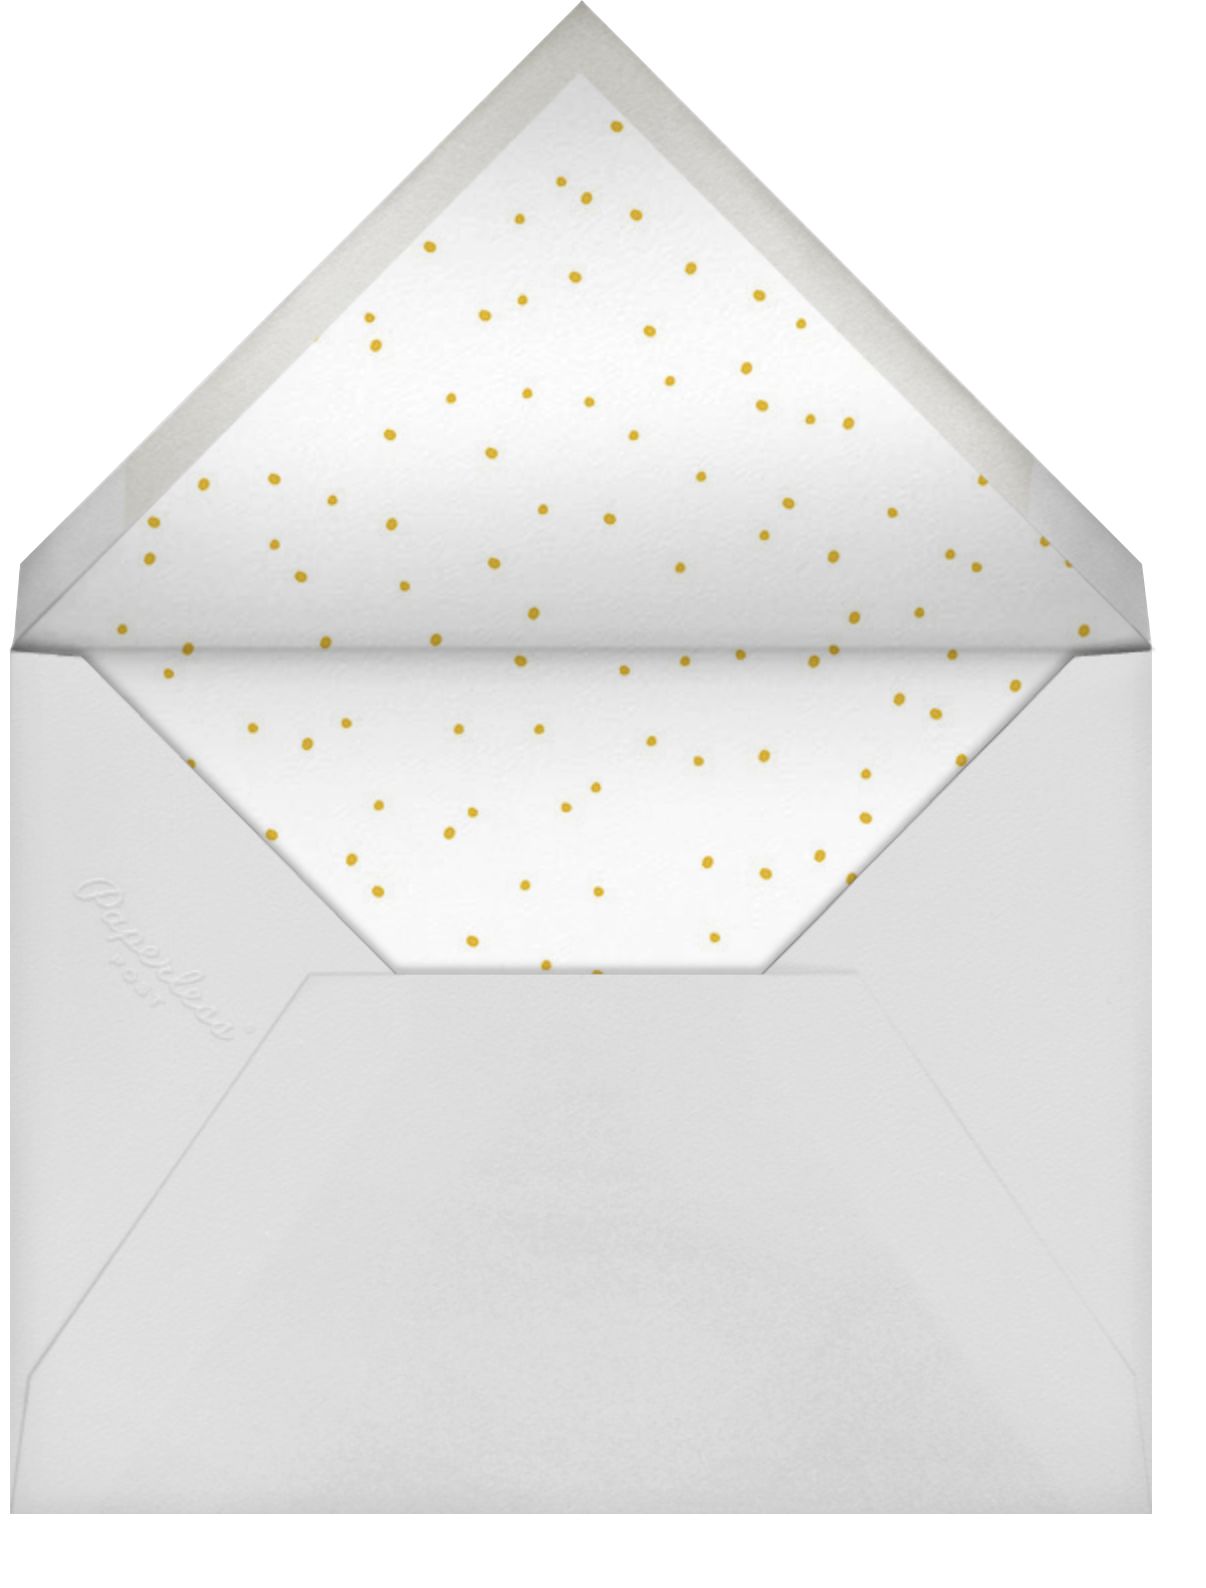 Pineapple Party - Linda and Harriett - Virtual parties - envelope back